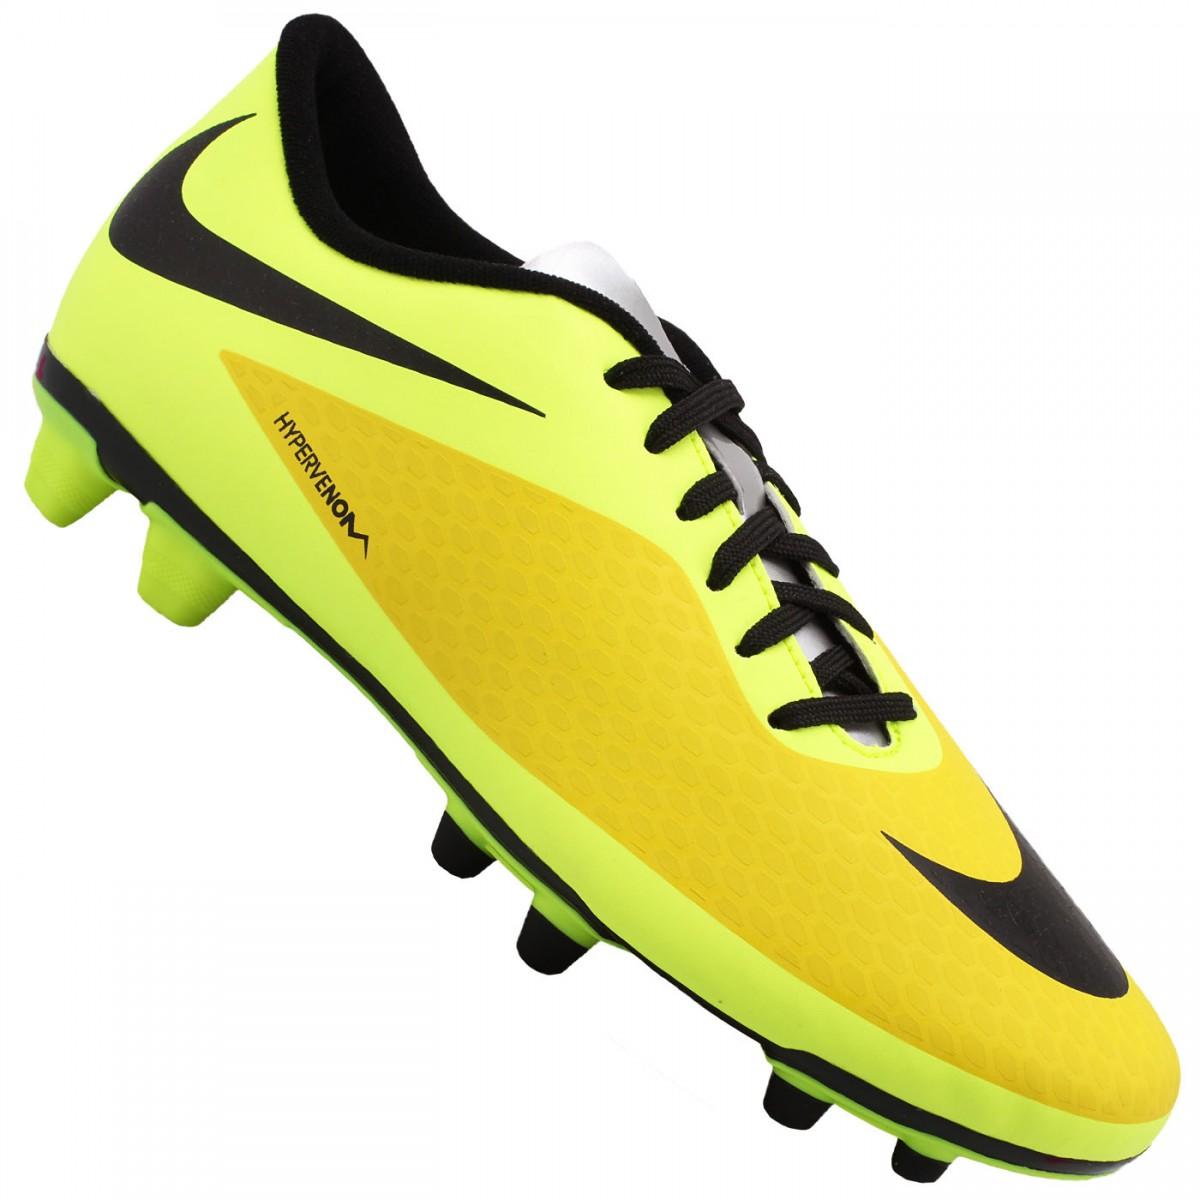 0e4822ff0d Chuteira Nike Hypervenom Phade TF